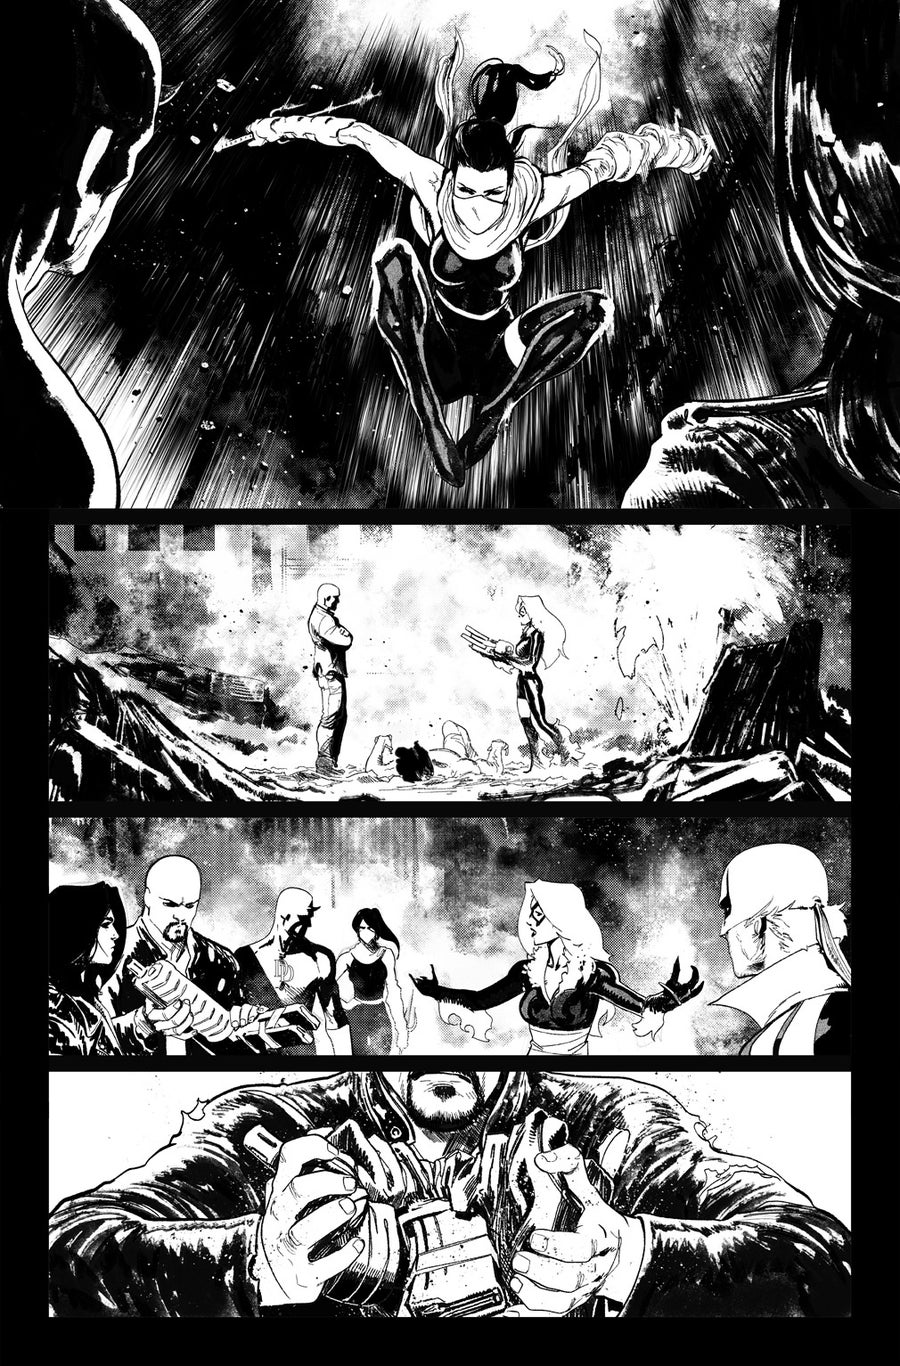 Image of DEFENDERS #9, p.20 ARTIST'S PROOF